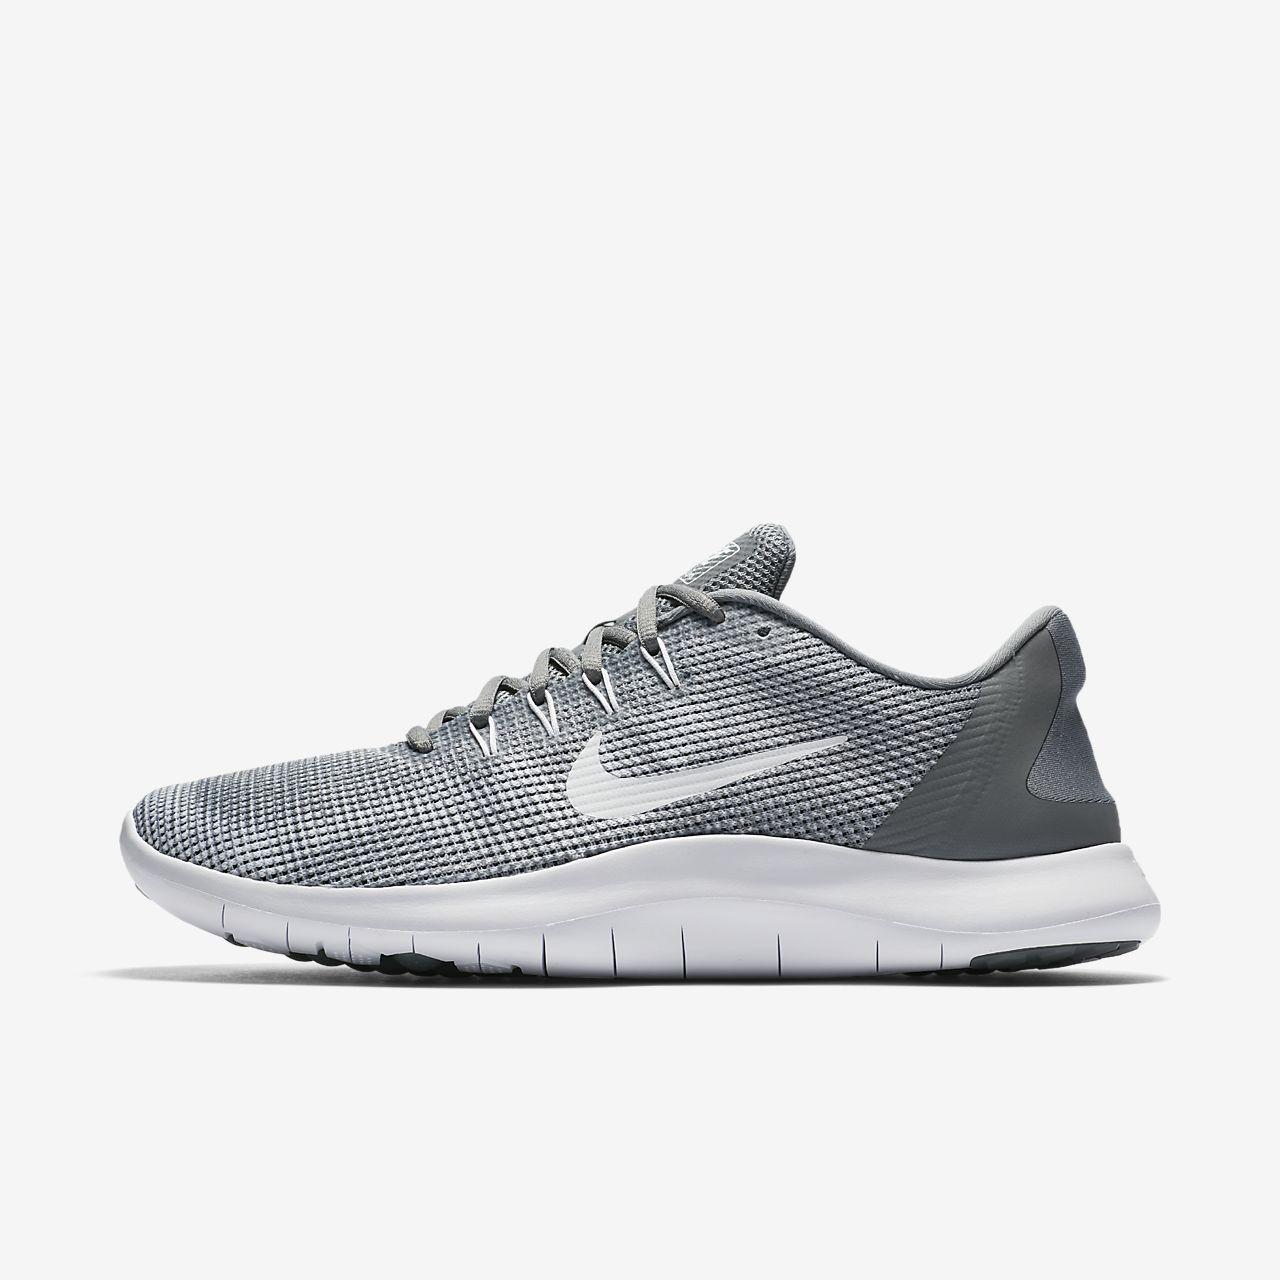 Tênis Nike Flex Run Masculino Preto e Branco | Nike flex